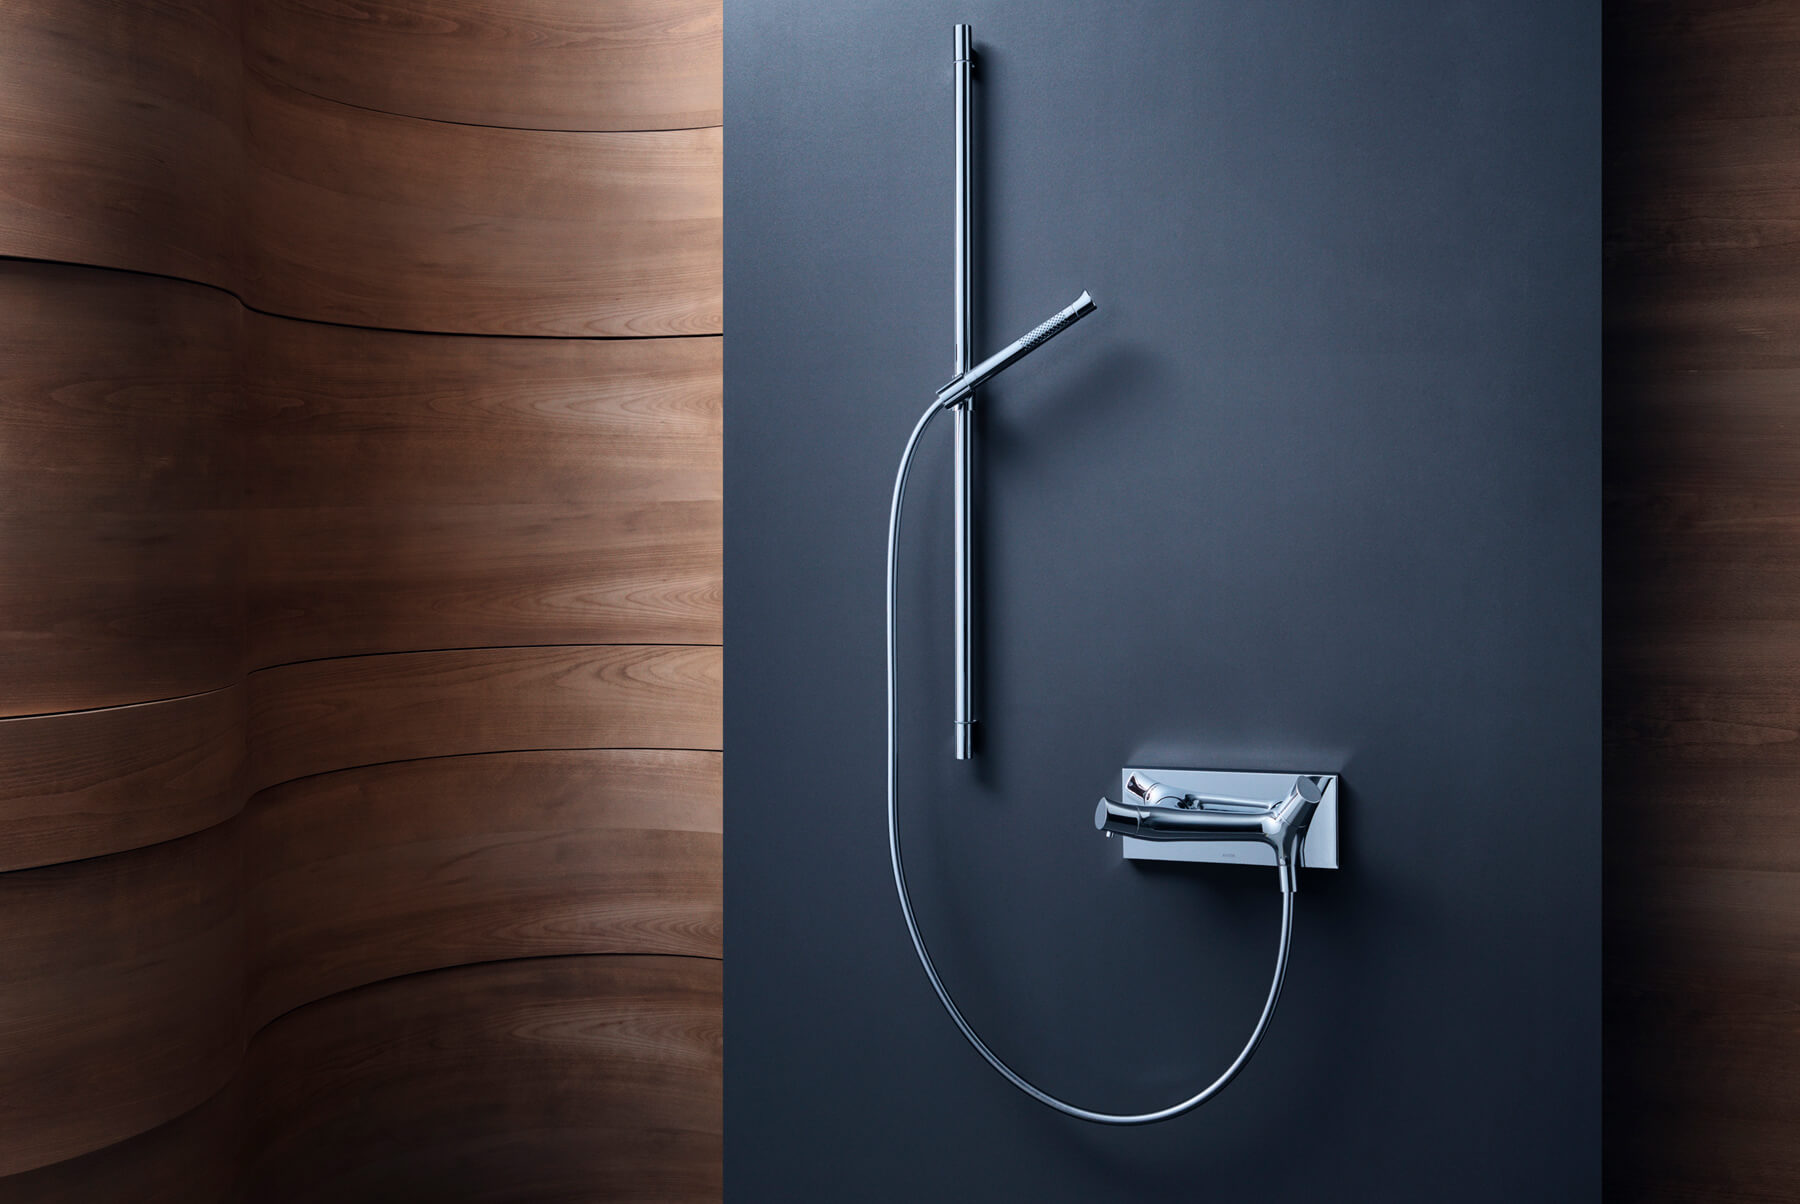 Brassware-AXOR-Stark-Organic-Inset-Shower-3-1800x1204